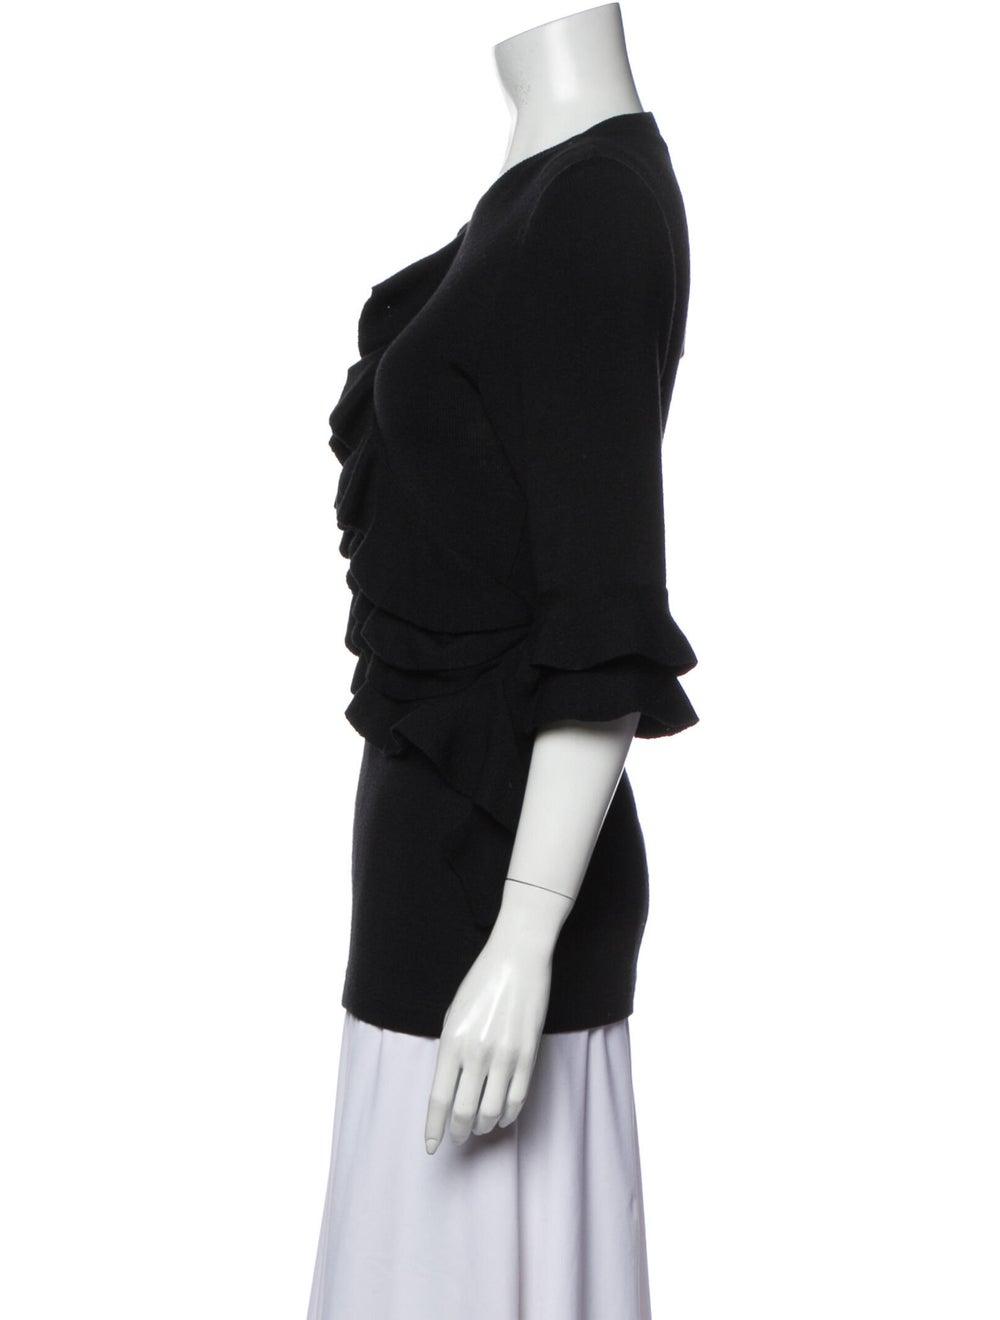 Plein Sud Crew Neck Sweater Black - image 2